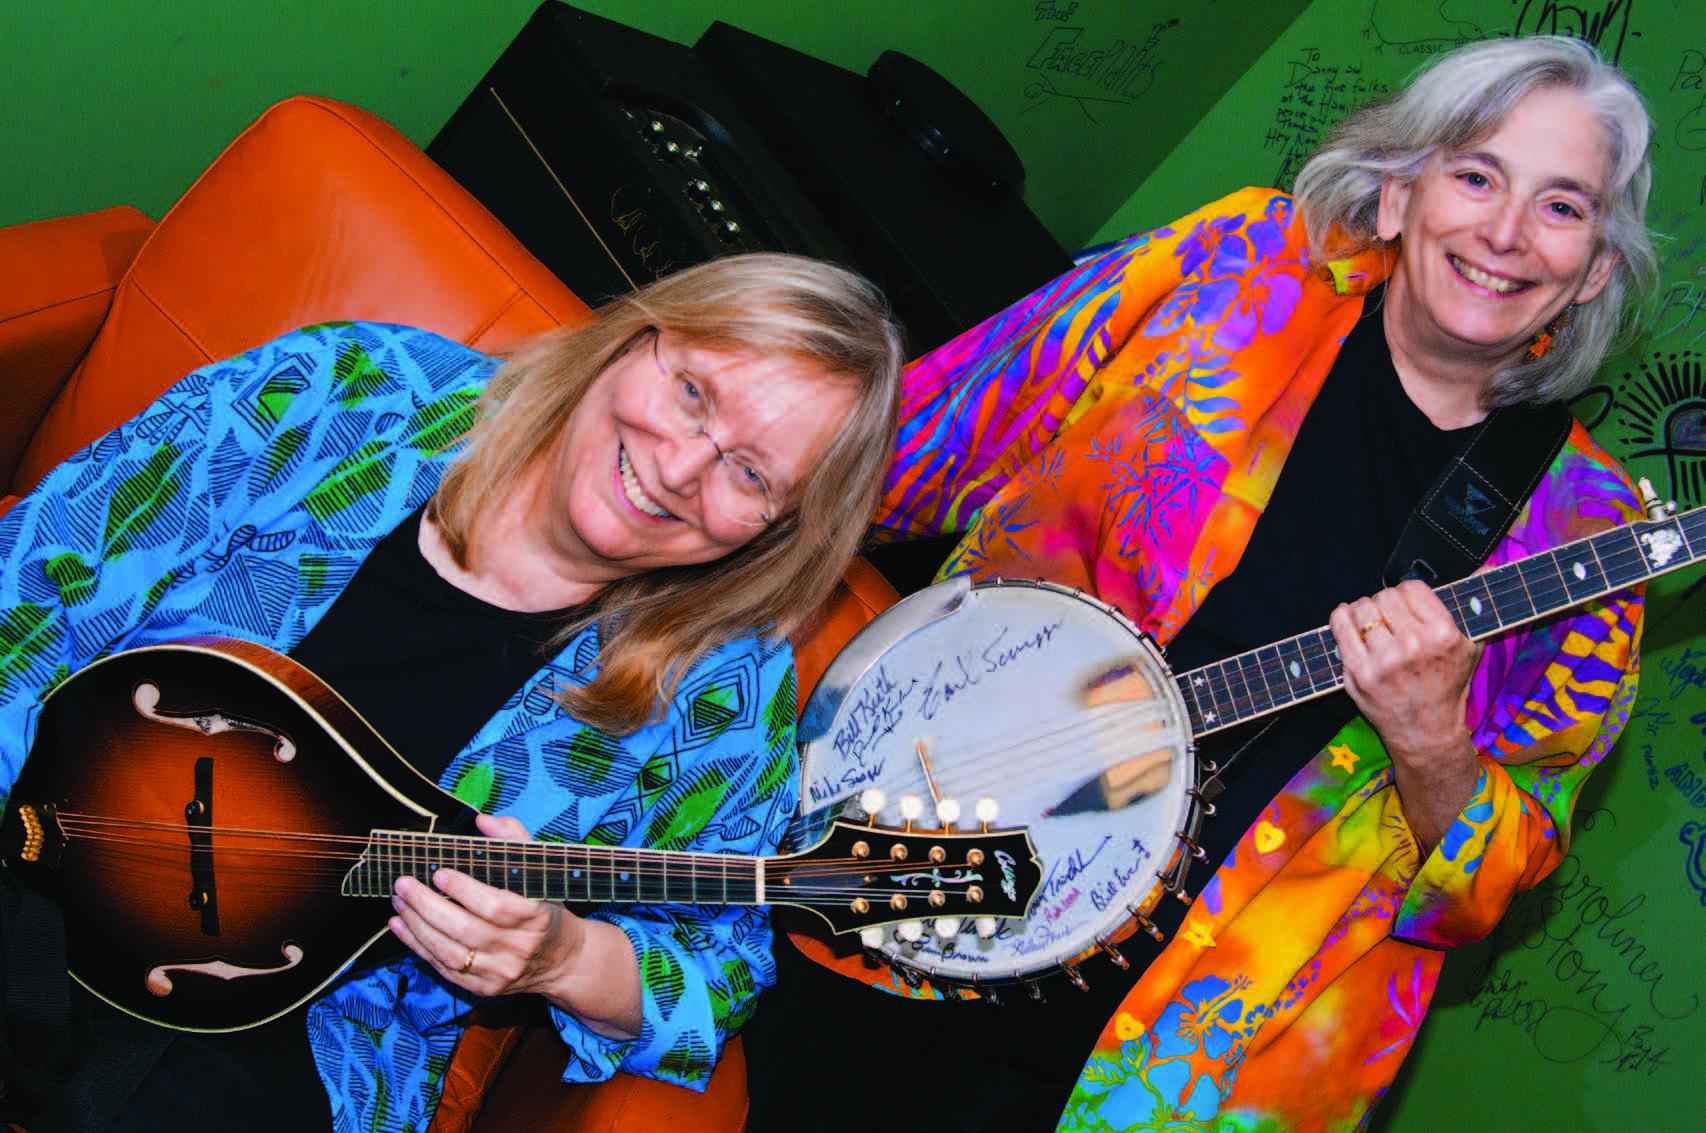 2X GRAMMY® Award winner Cathy Fink & Marcy Marxer